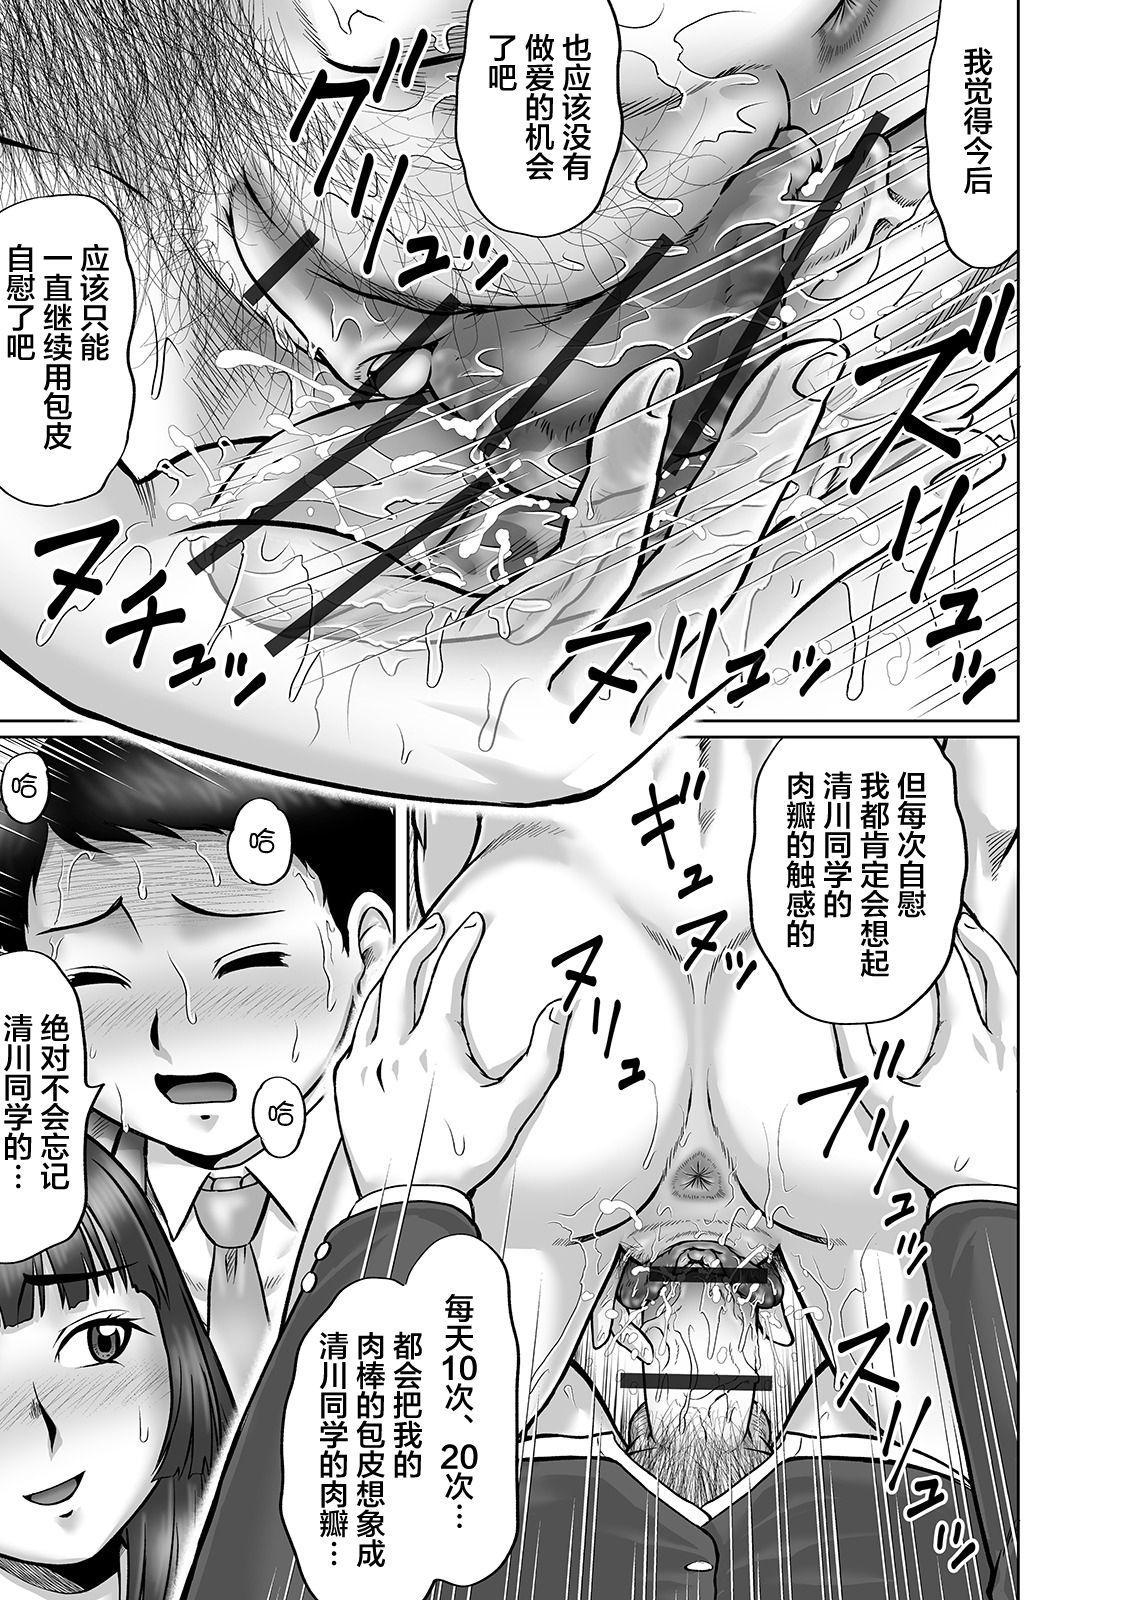 Sonna Tomodachi 22